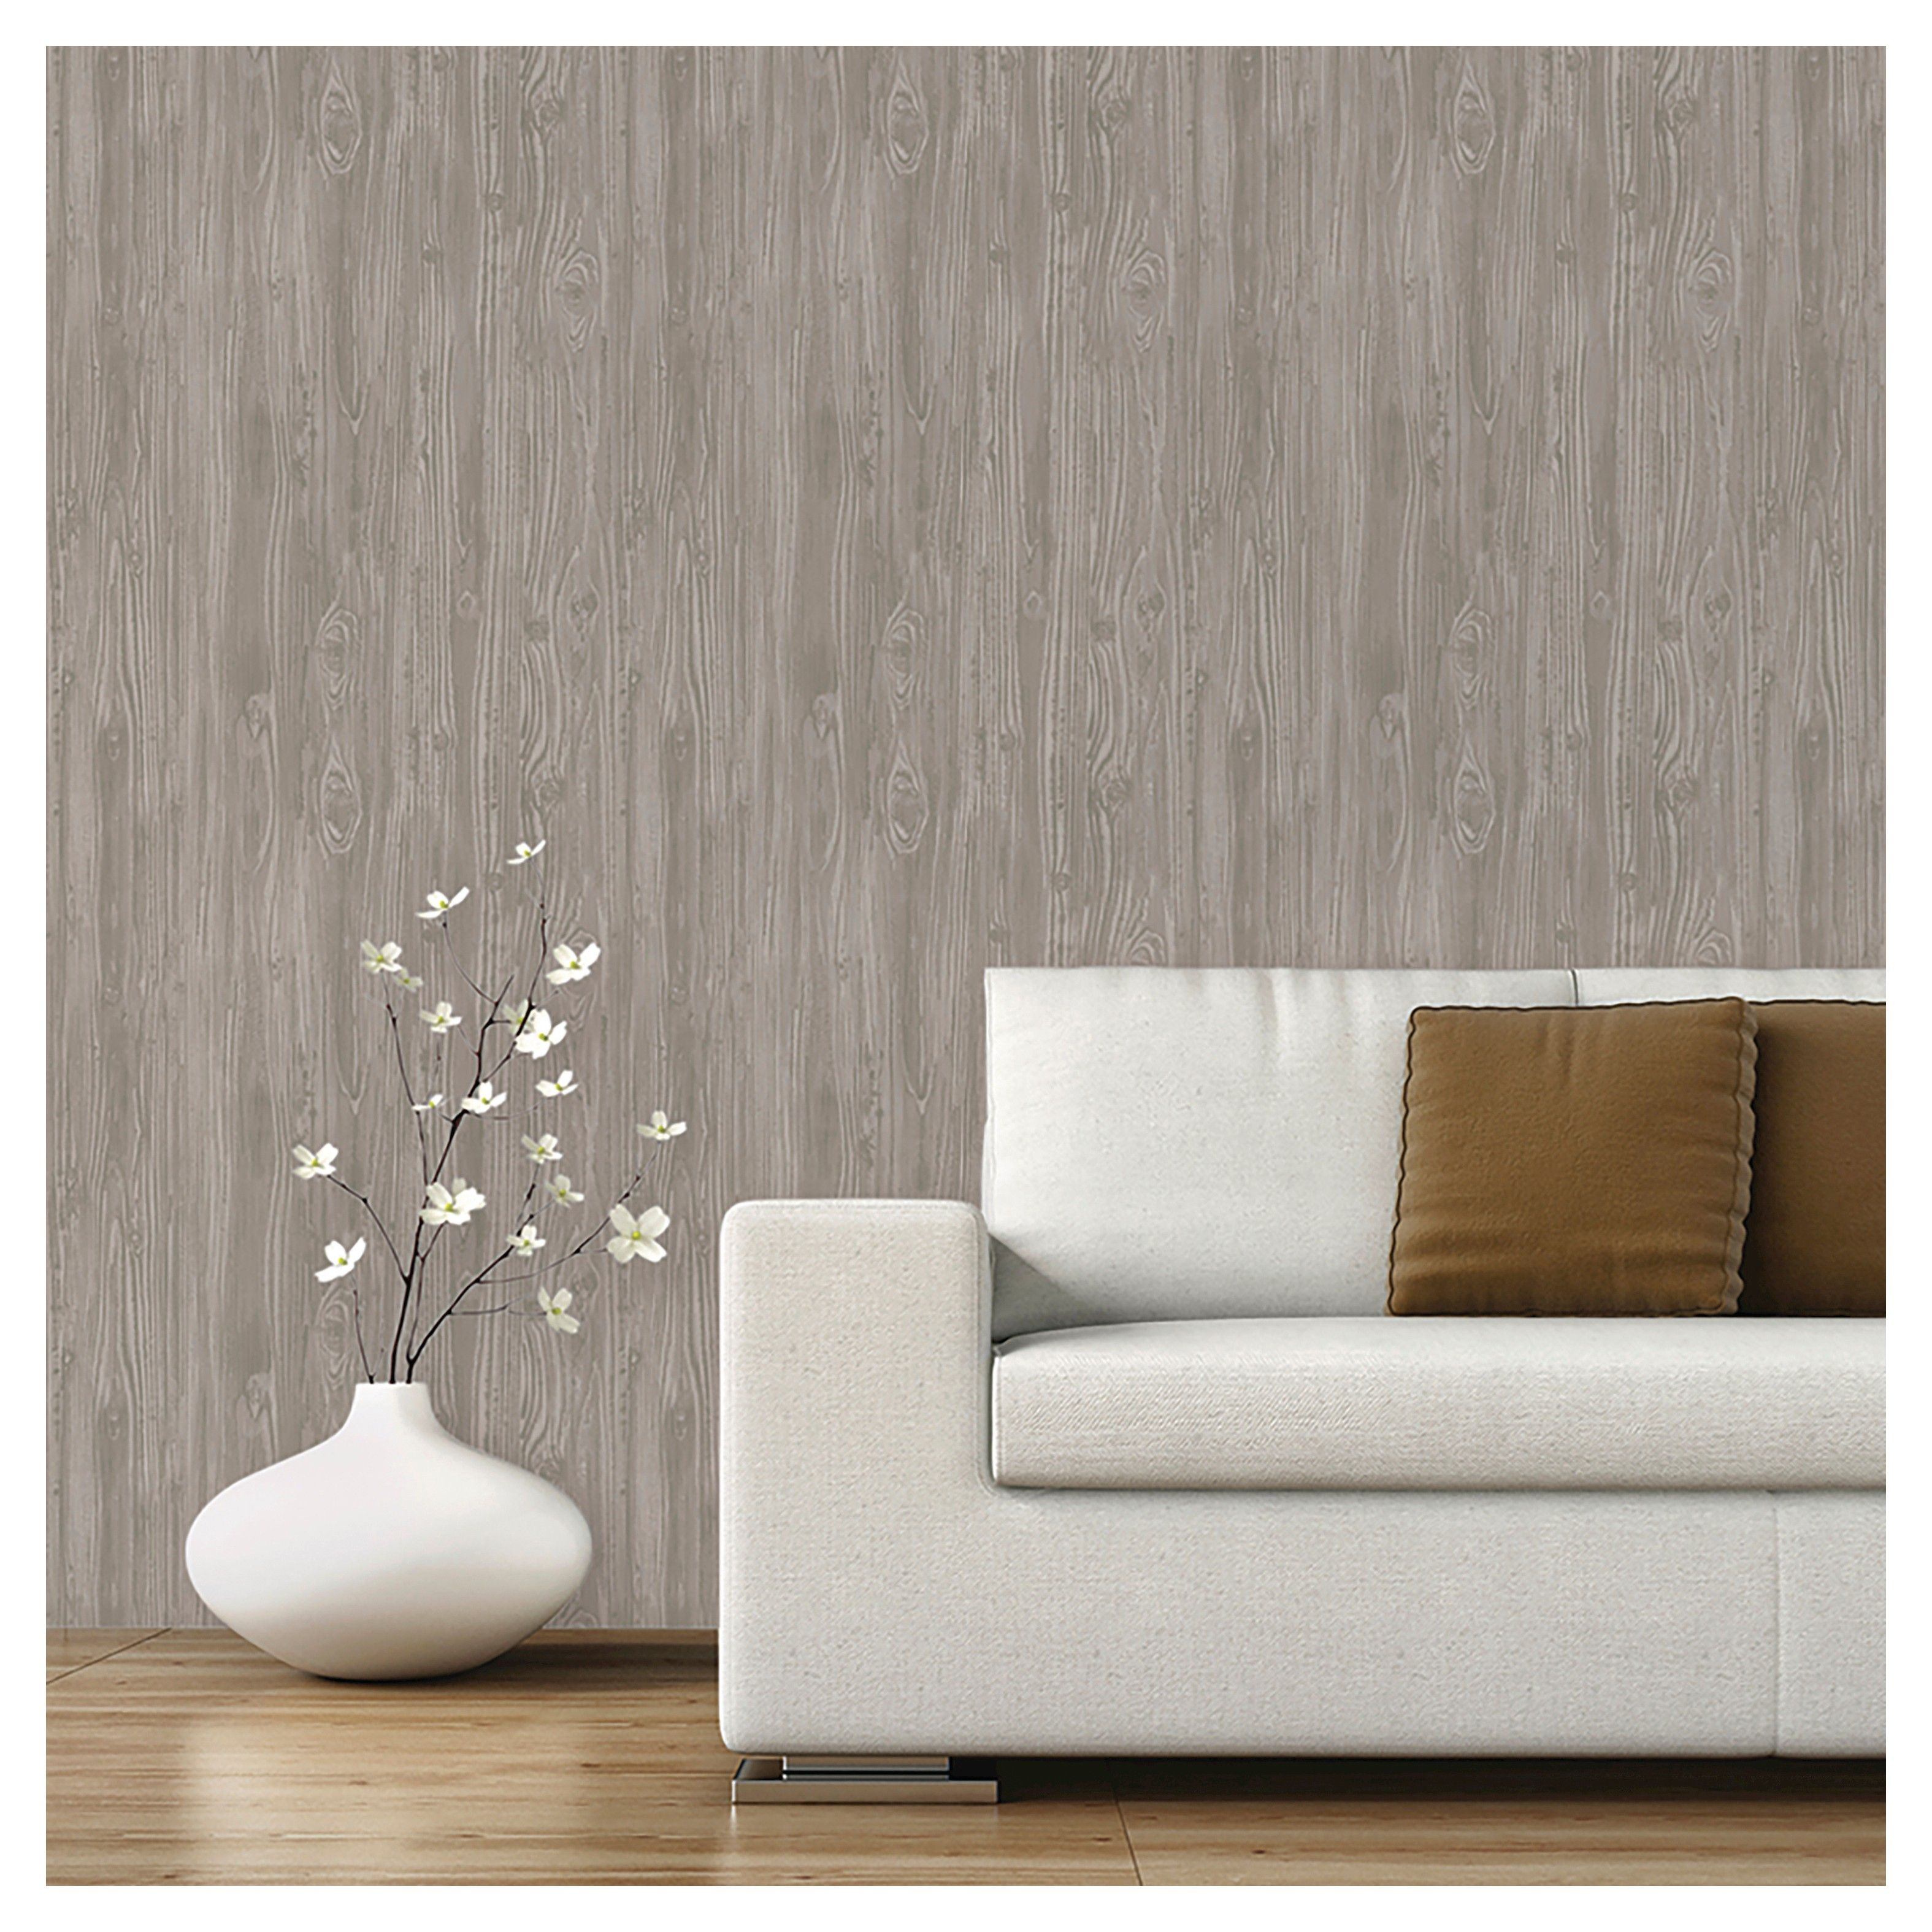 Devine Color Textured Driftwood Peel Stick Wallpaper Brown Peel And Stick Wallpaper Textured Wallpaper Wallpaper Accent Wall